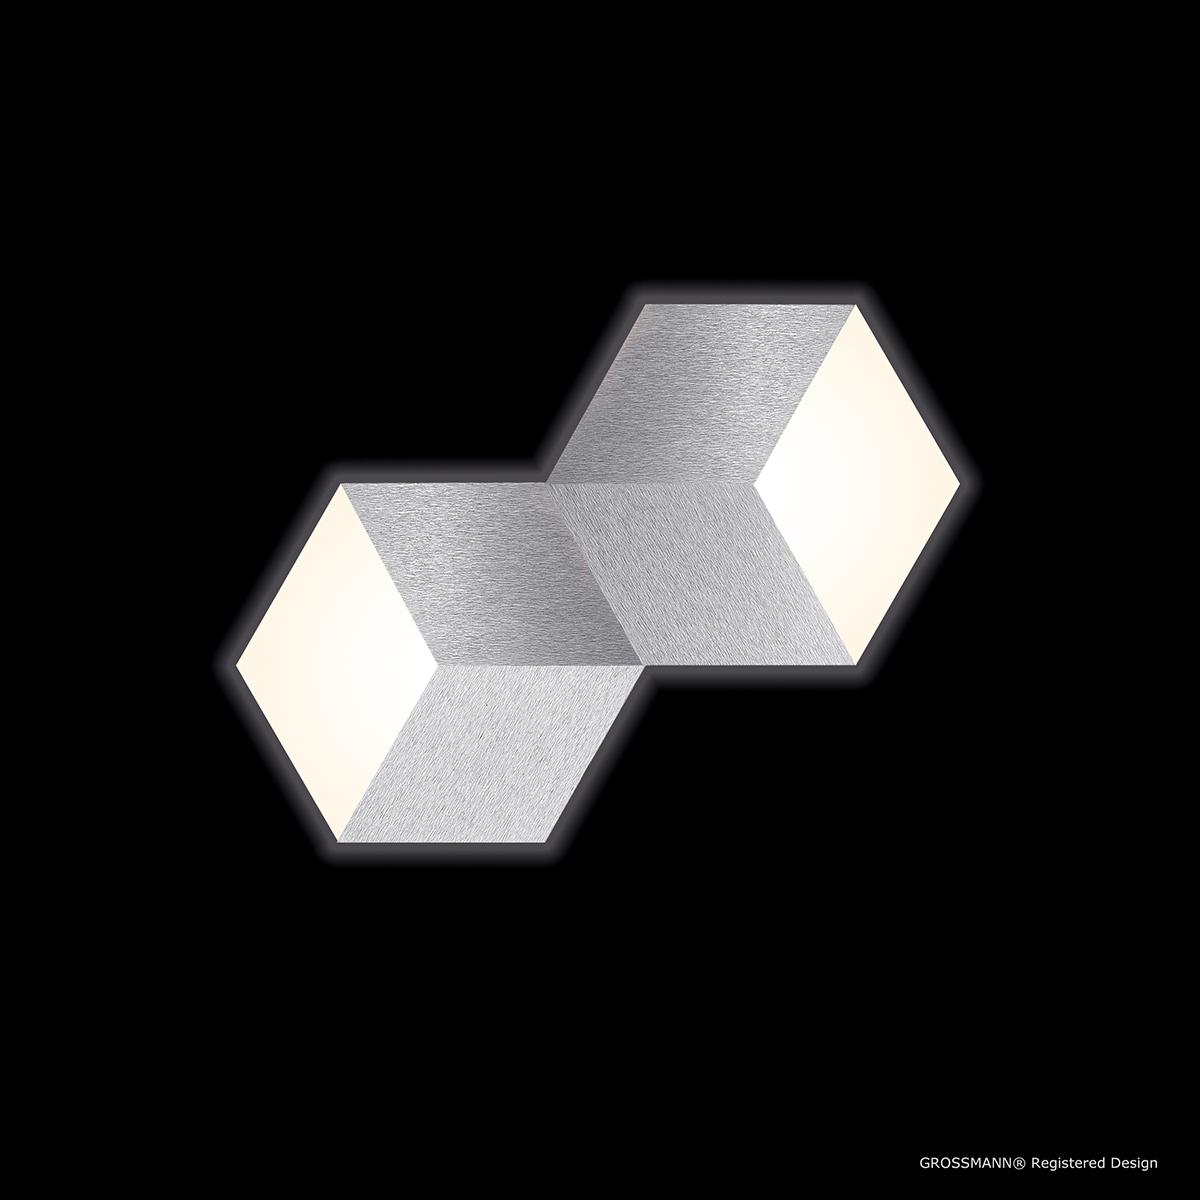 Grossmann Geo LED Wand- / Deckenleuchte 72-779-072